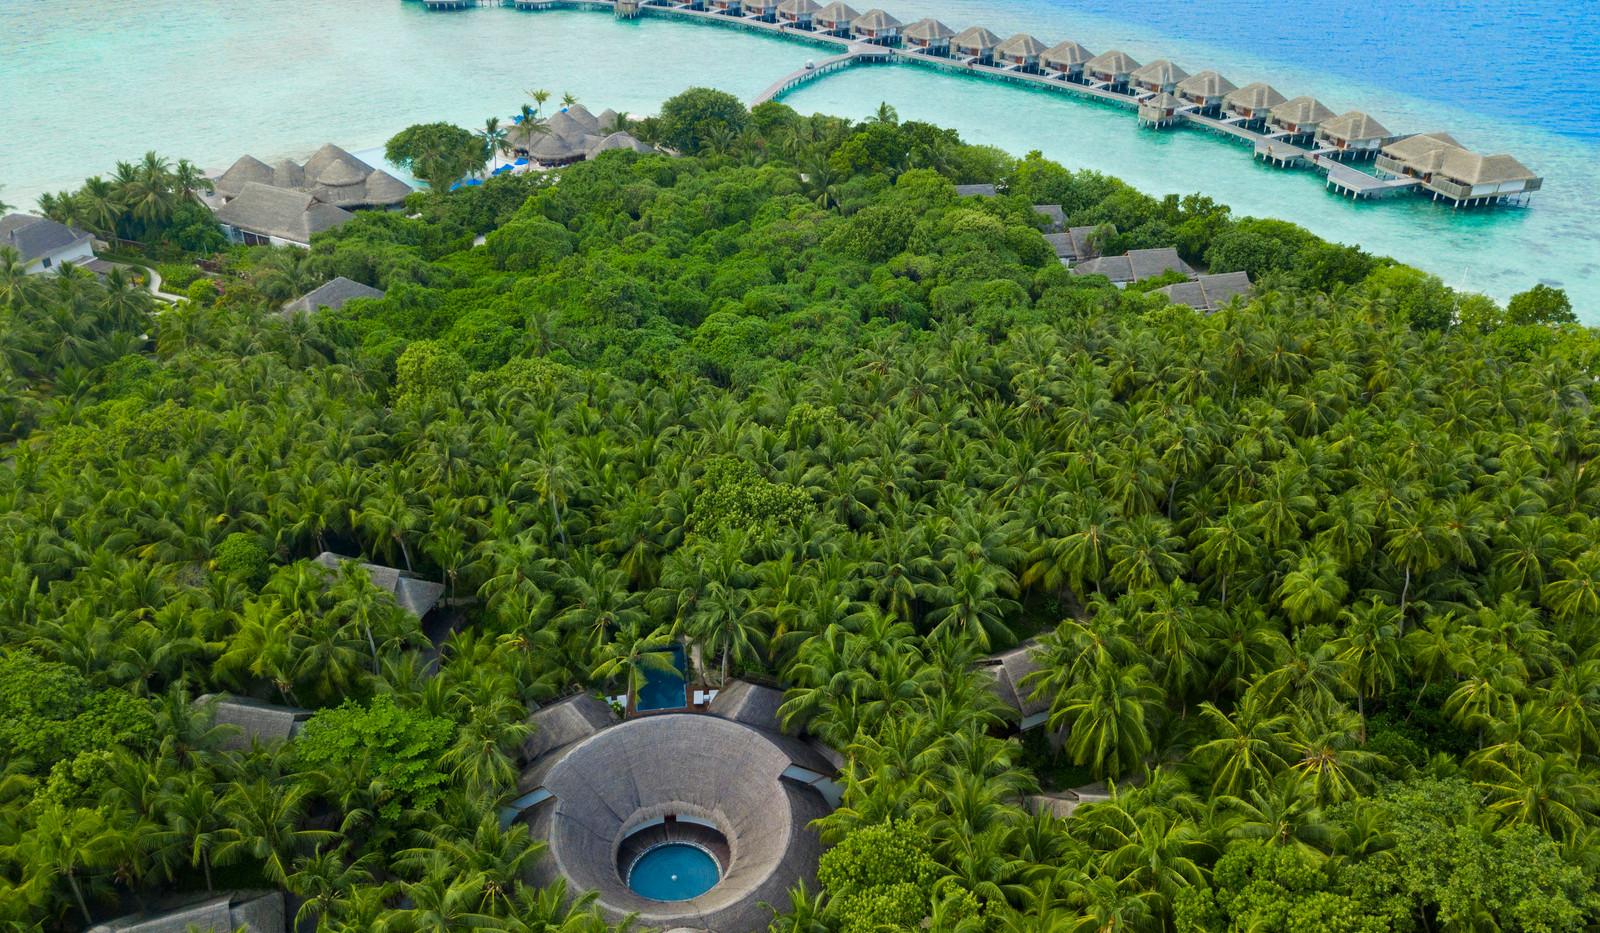 Dusit_Thani_Maldives_Aerial-2531-3.jpg